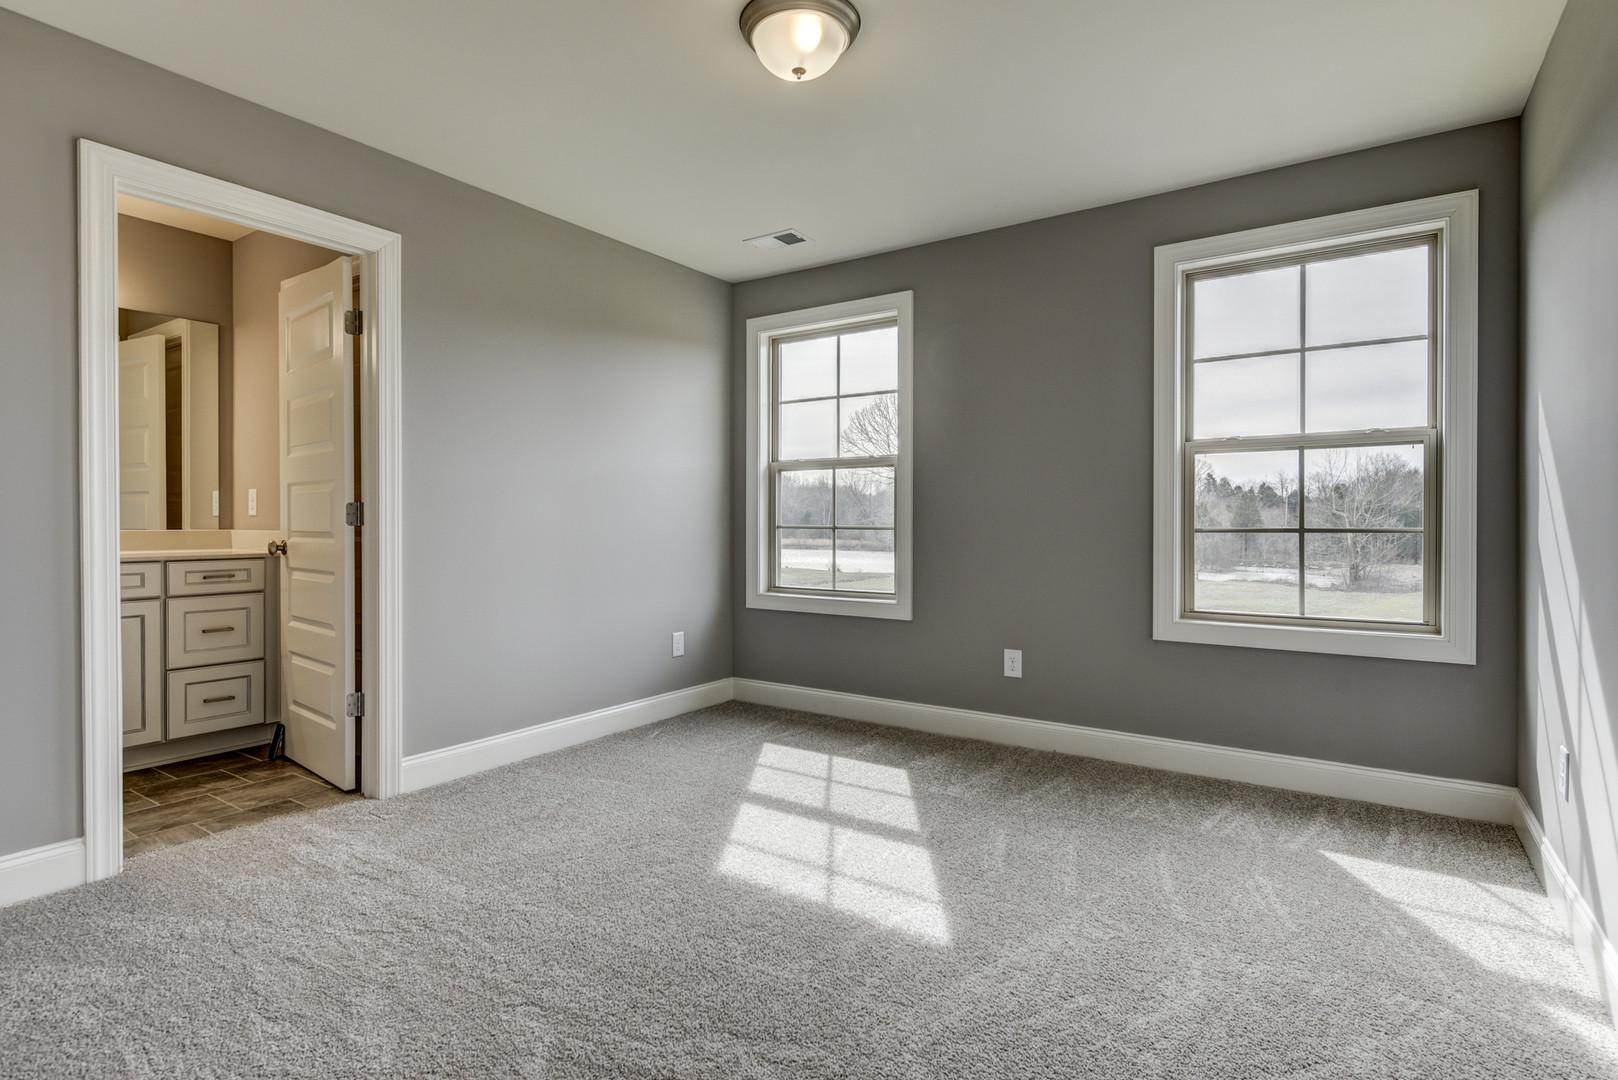 Stonington Bedroom w/ Bathroom